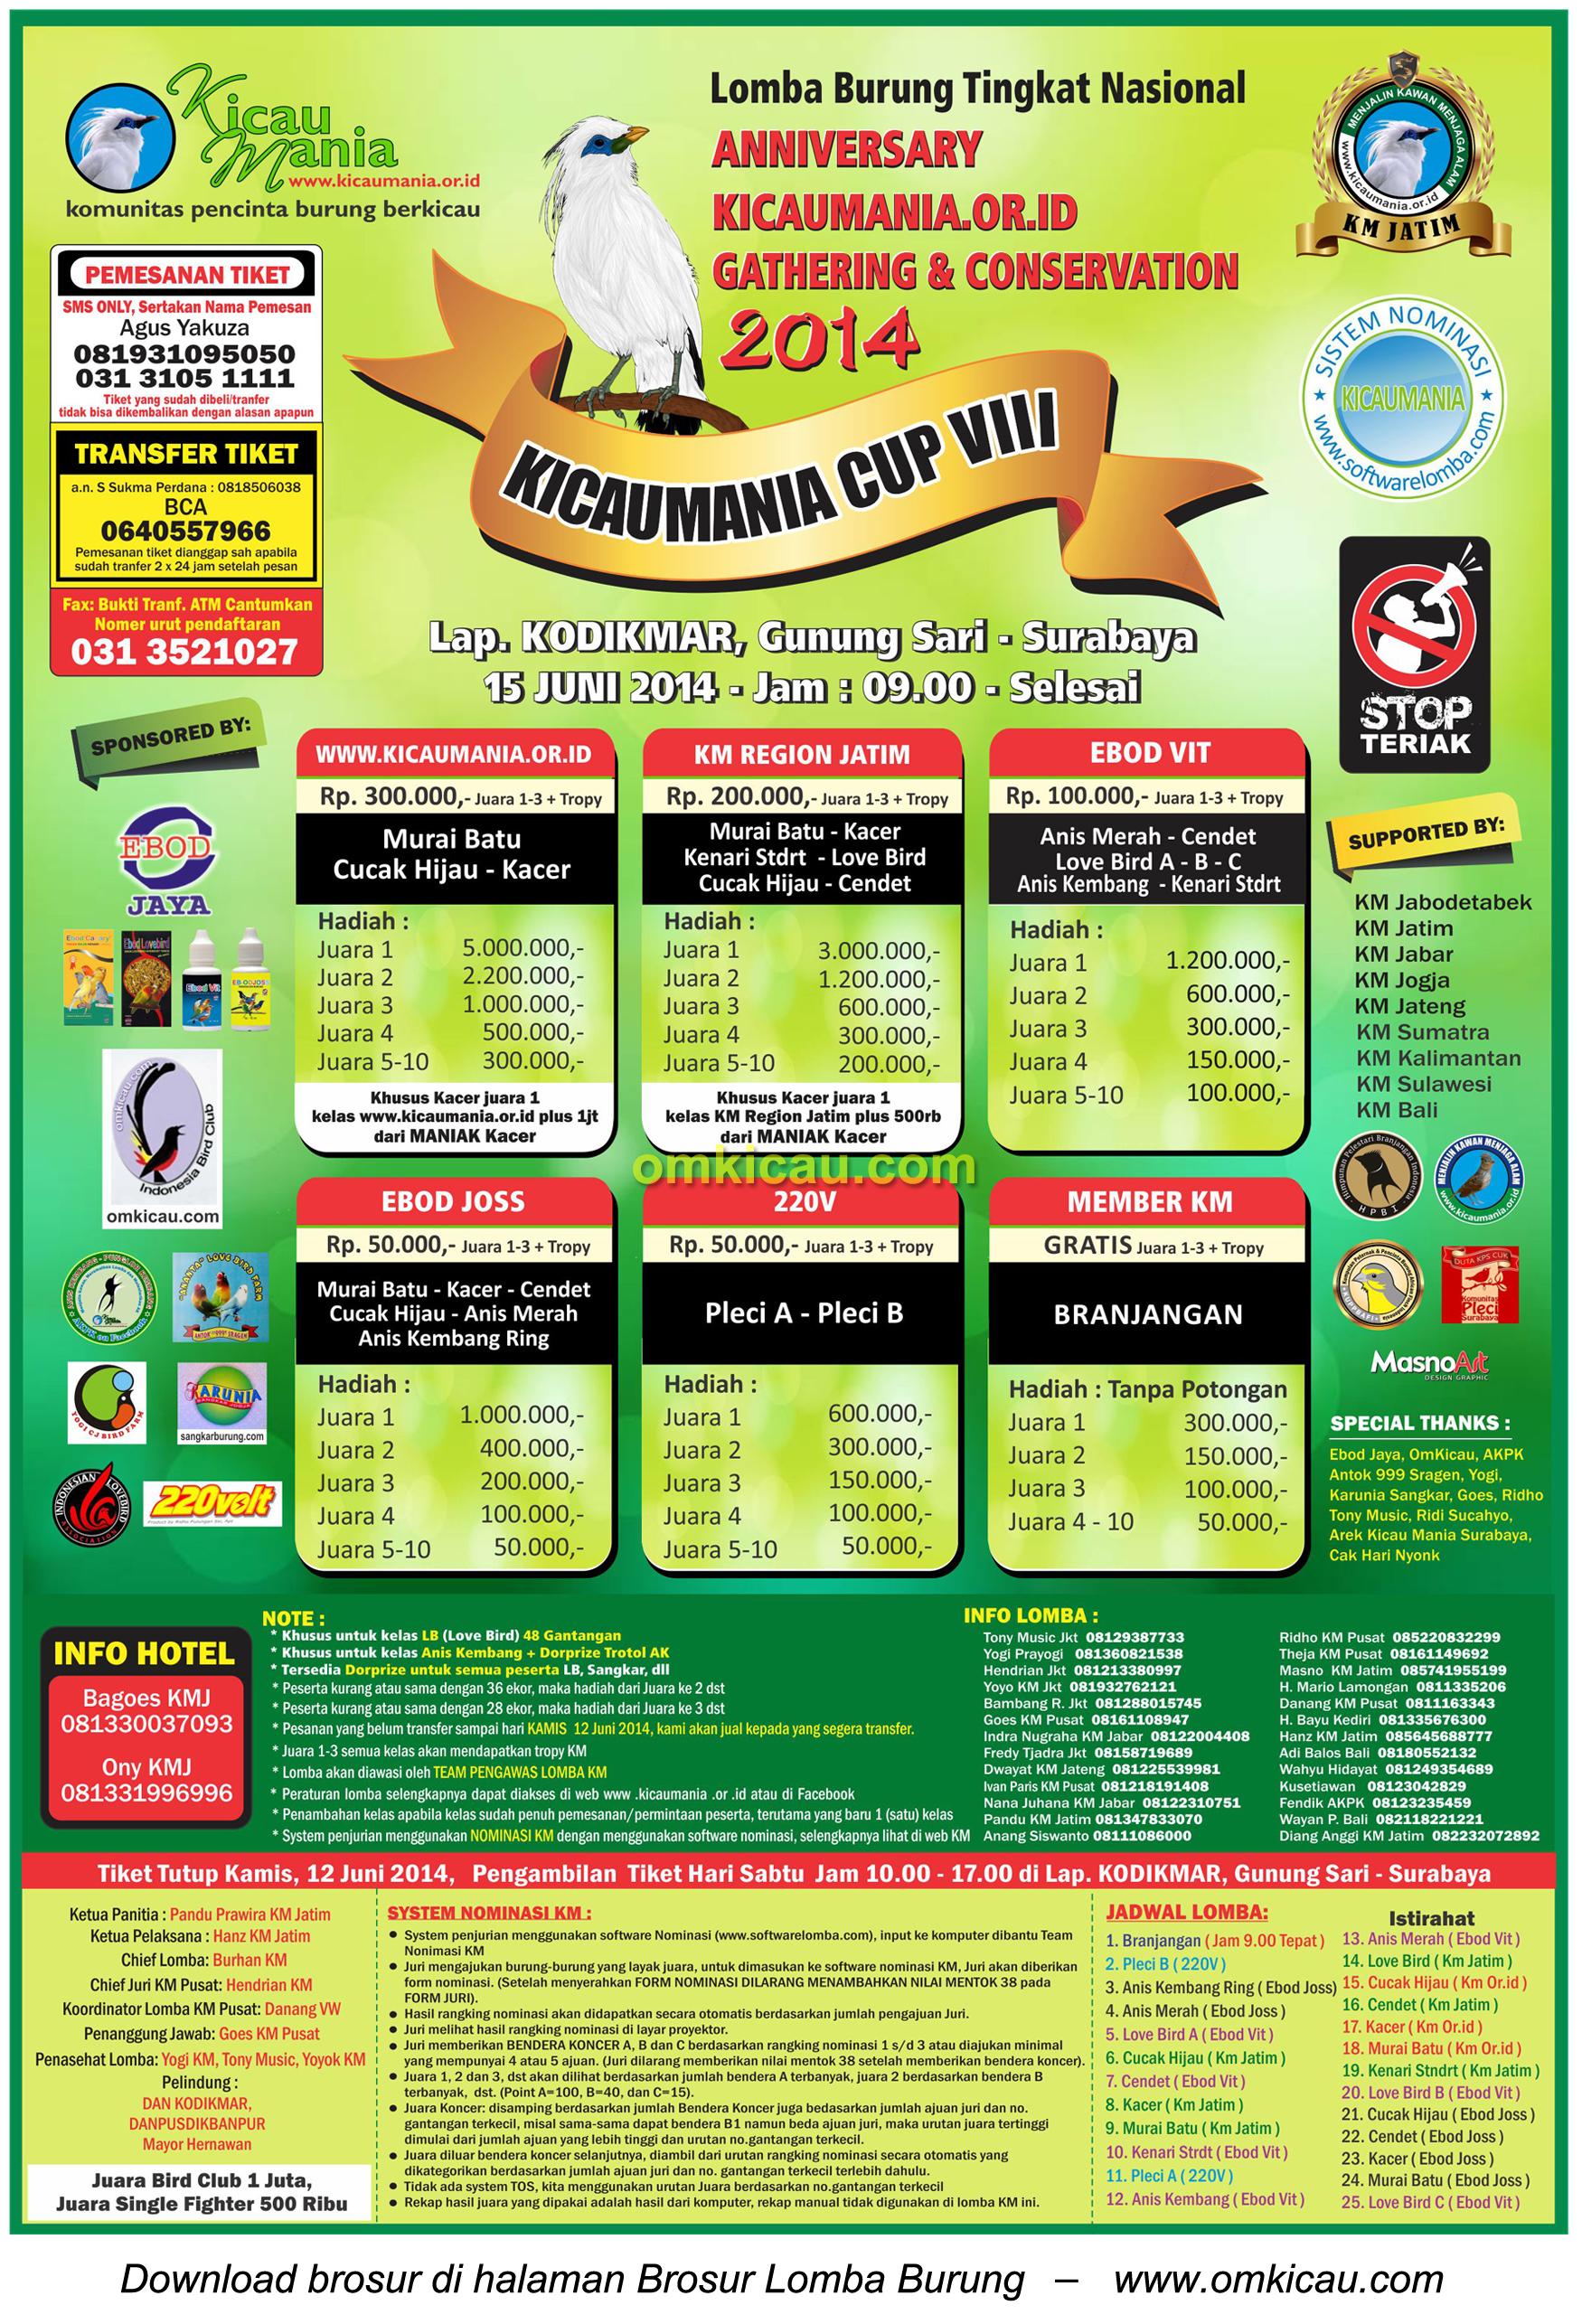 Brosur Lomba Burung Berkicau Kicaumania Cup VIII, Surabaya -15 Juni 2014.